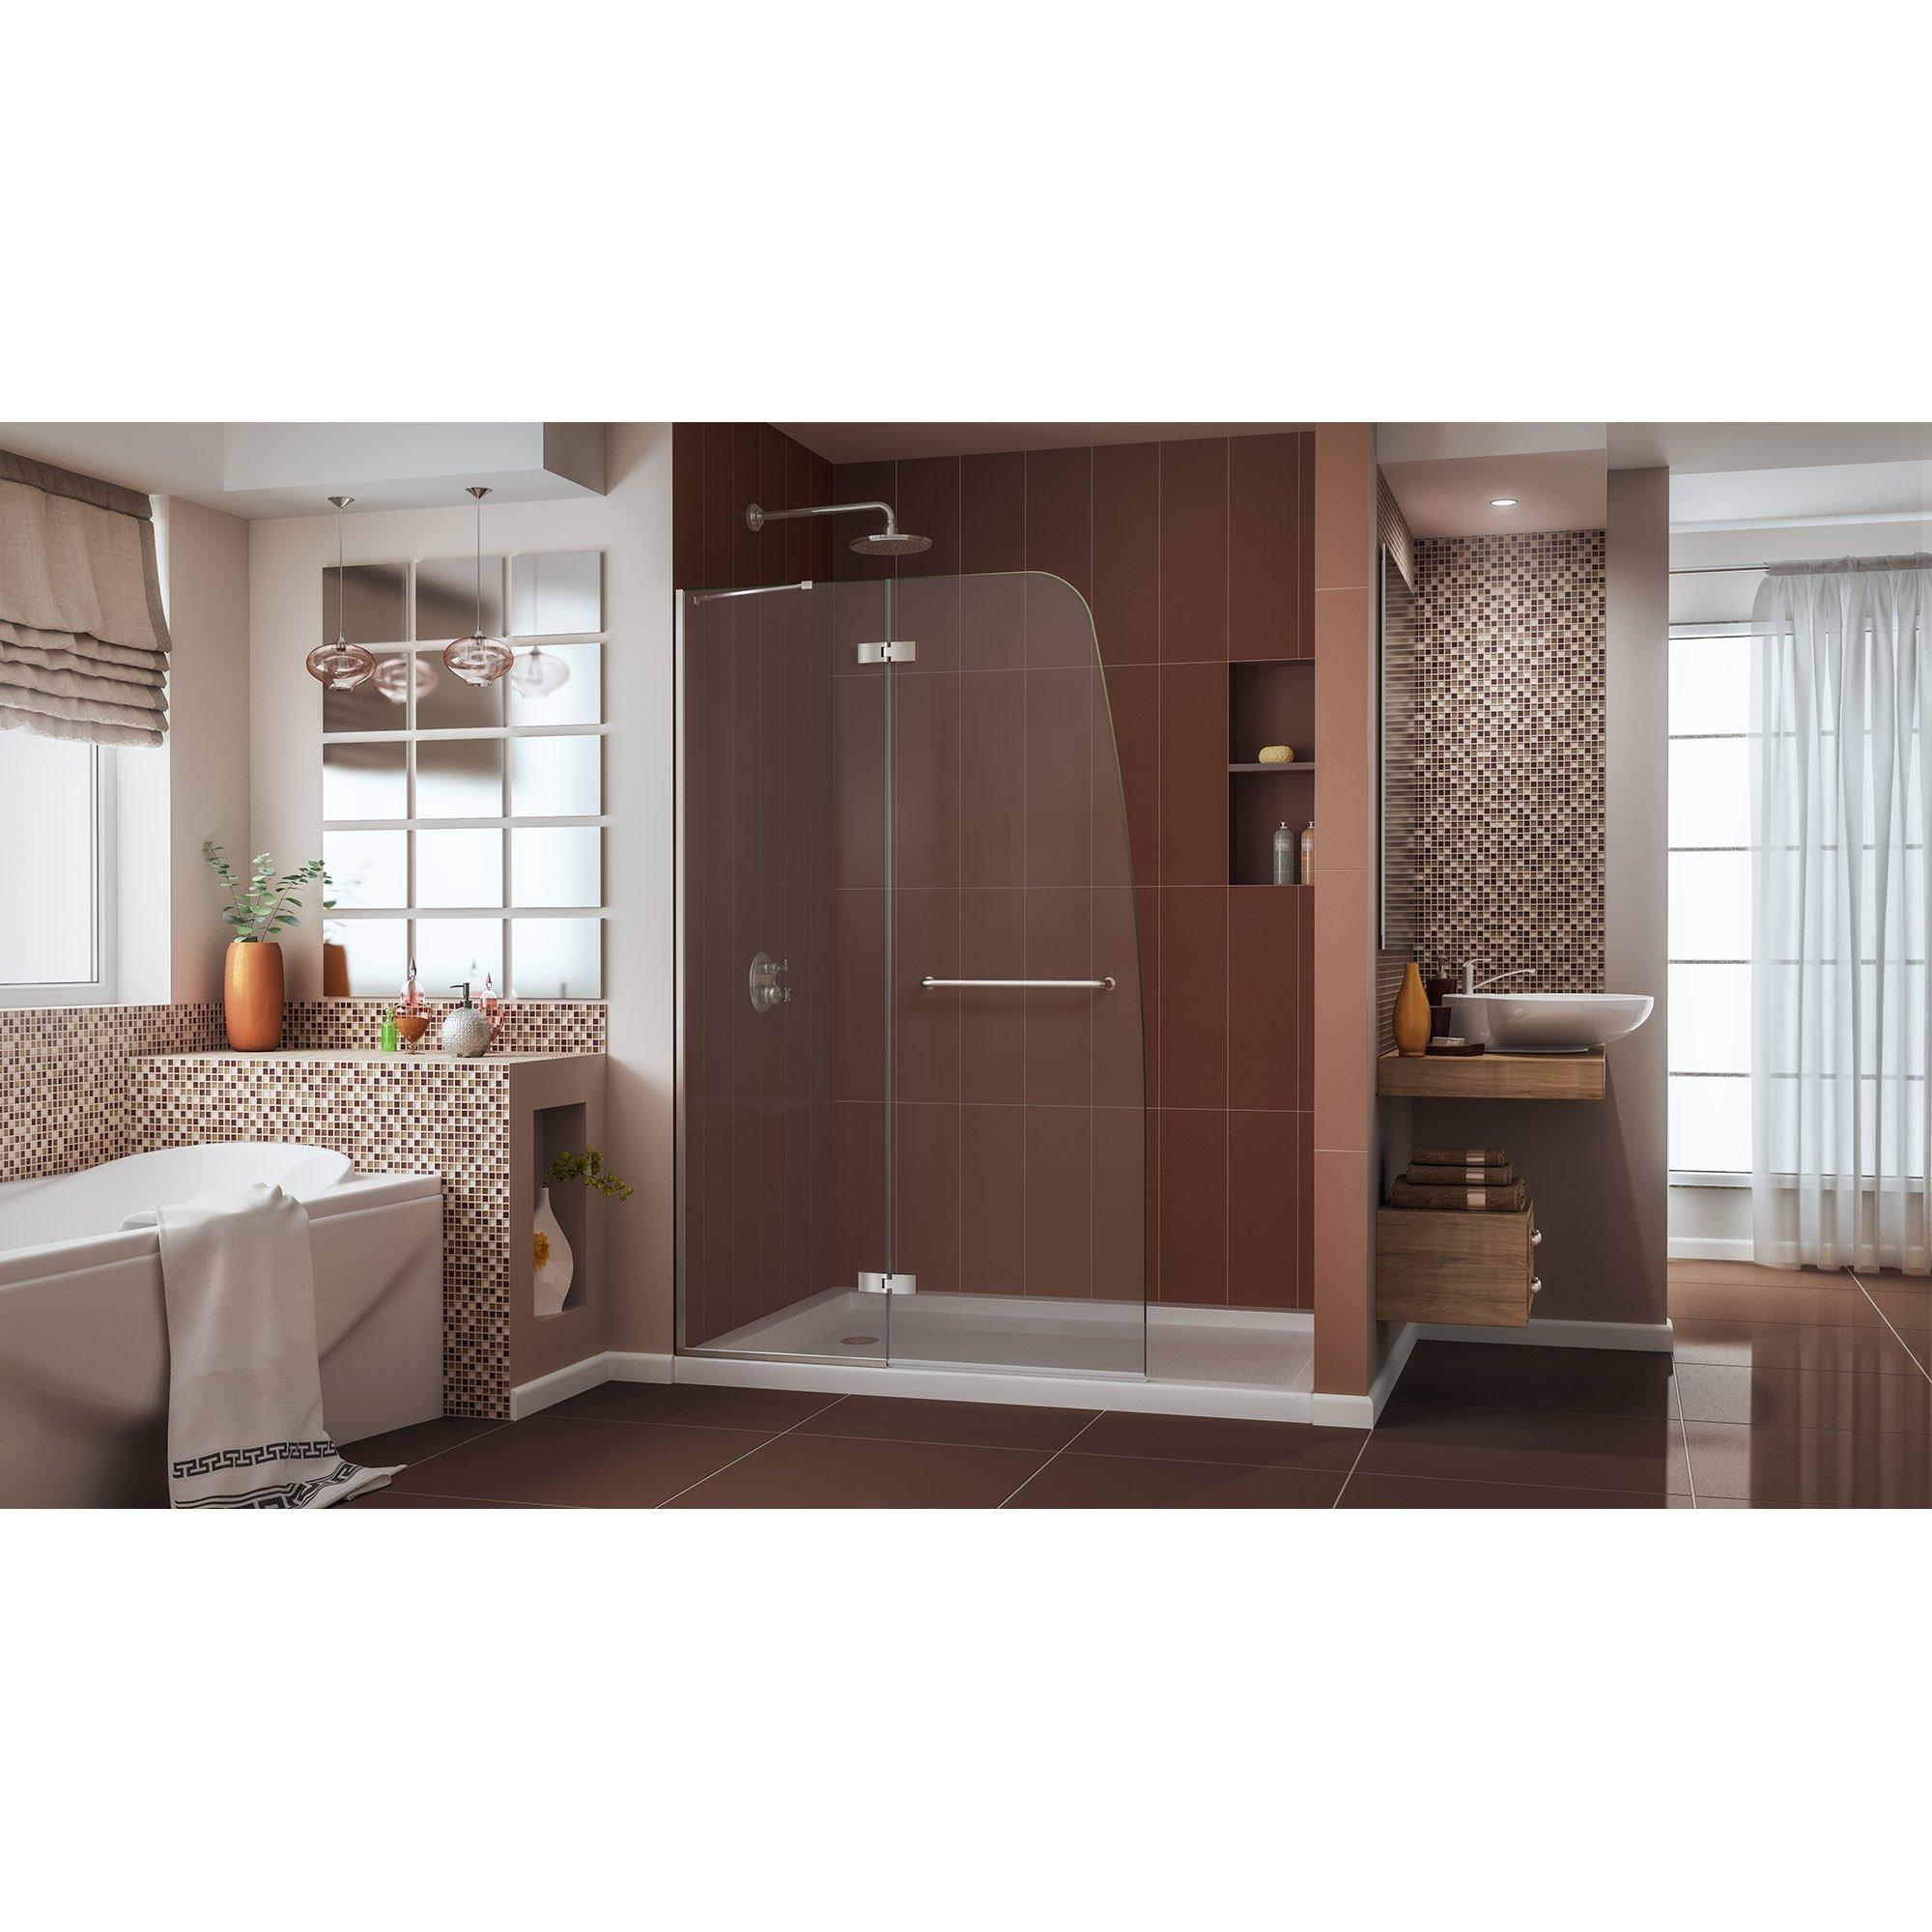 DreamLine Aqua Ultra 45 in. W x 72 in. H Frameless Hinged Shower Door in Brushed Nickel, SHDR-3445720-04 by DreamLine (Image #3)